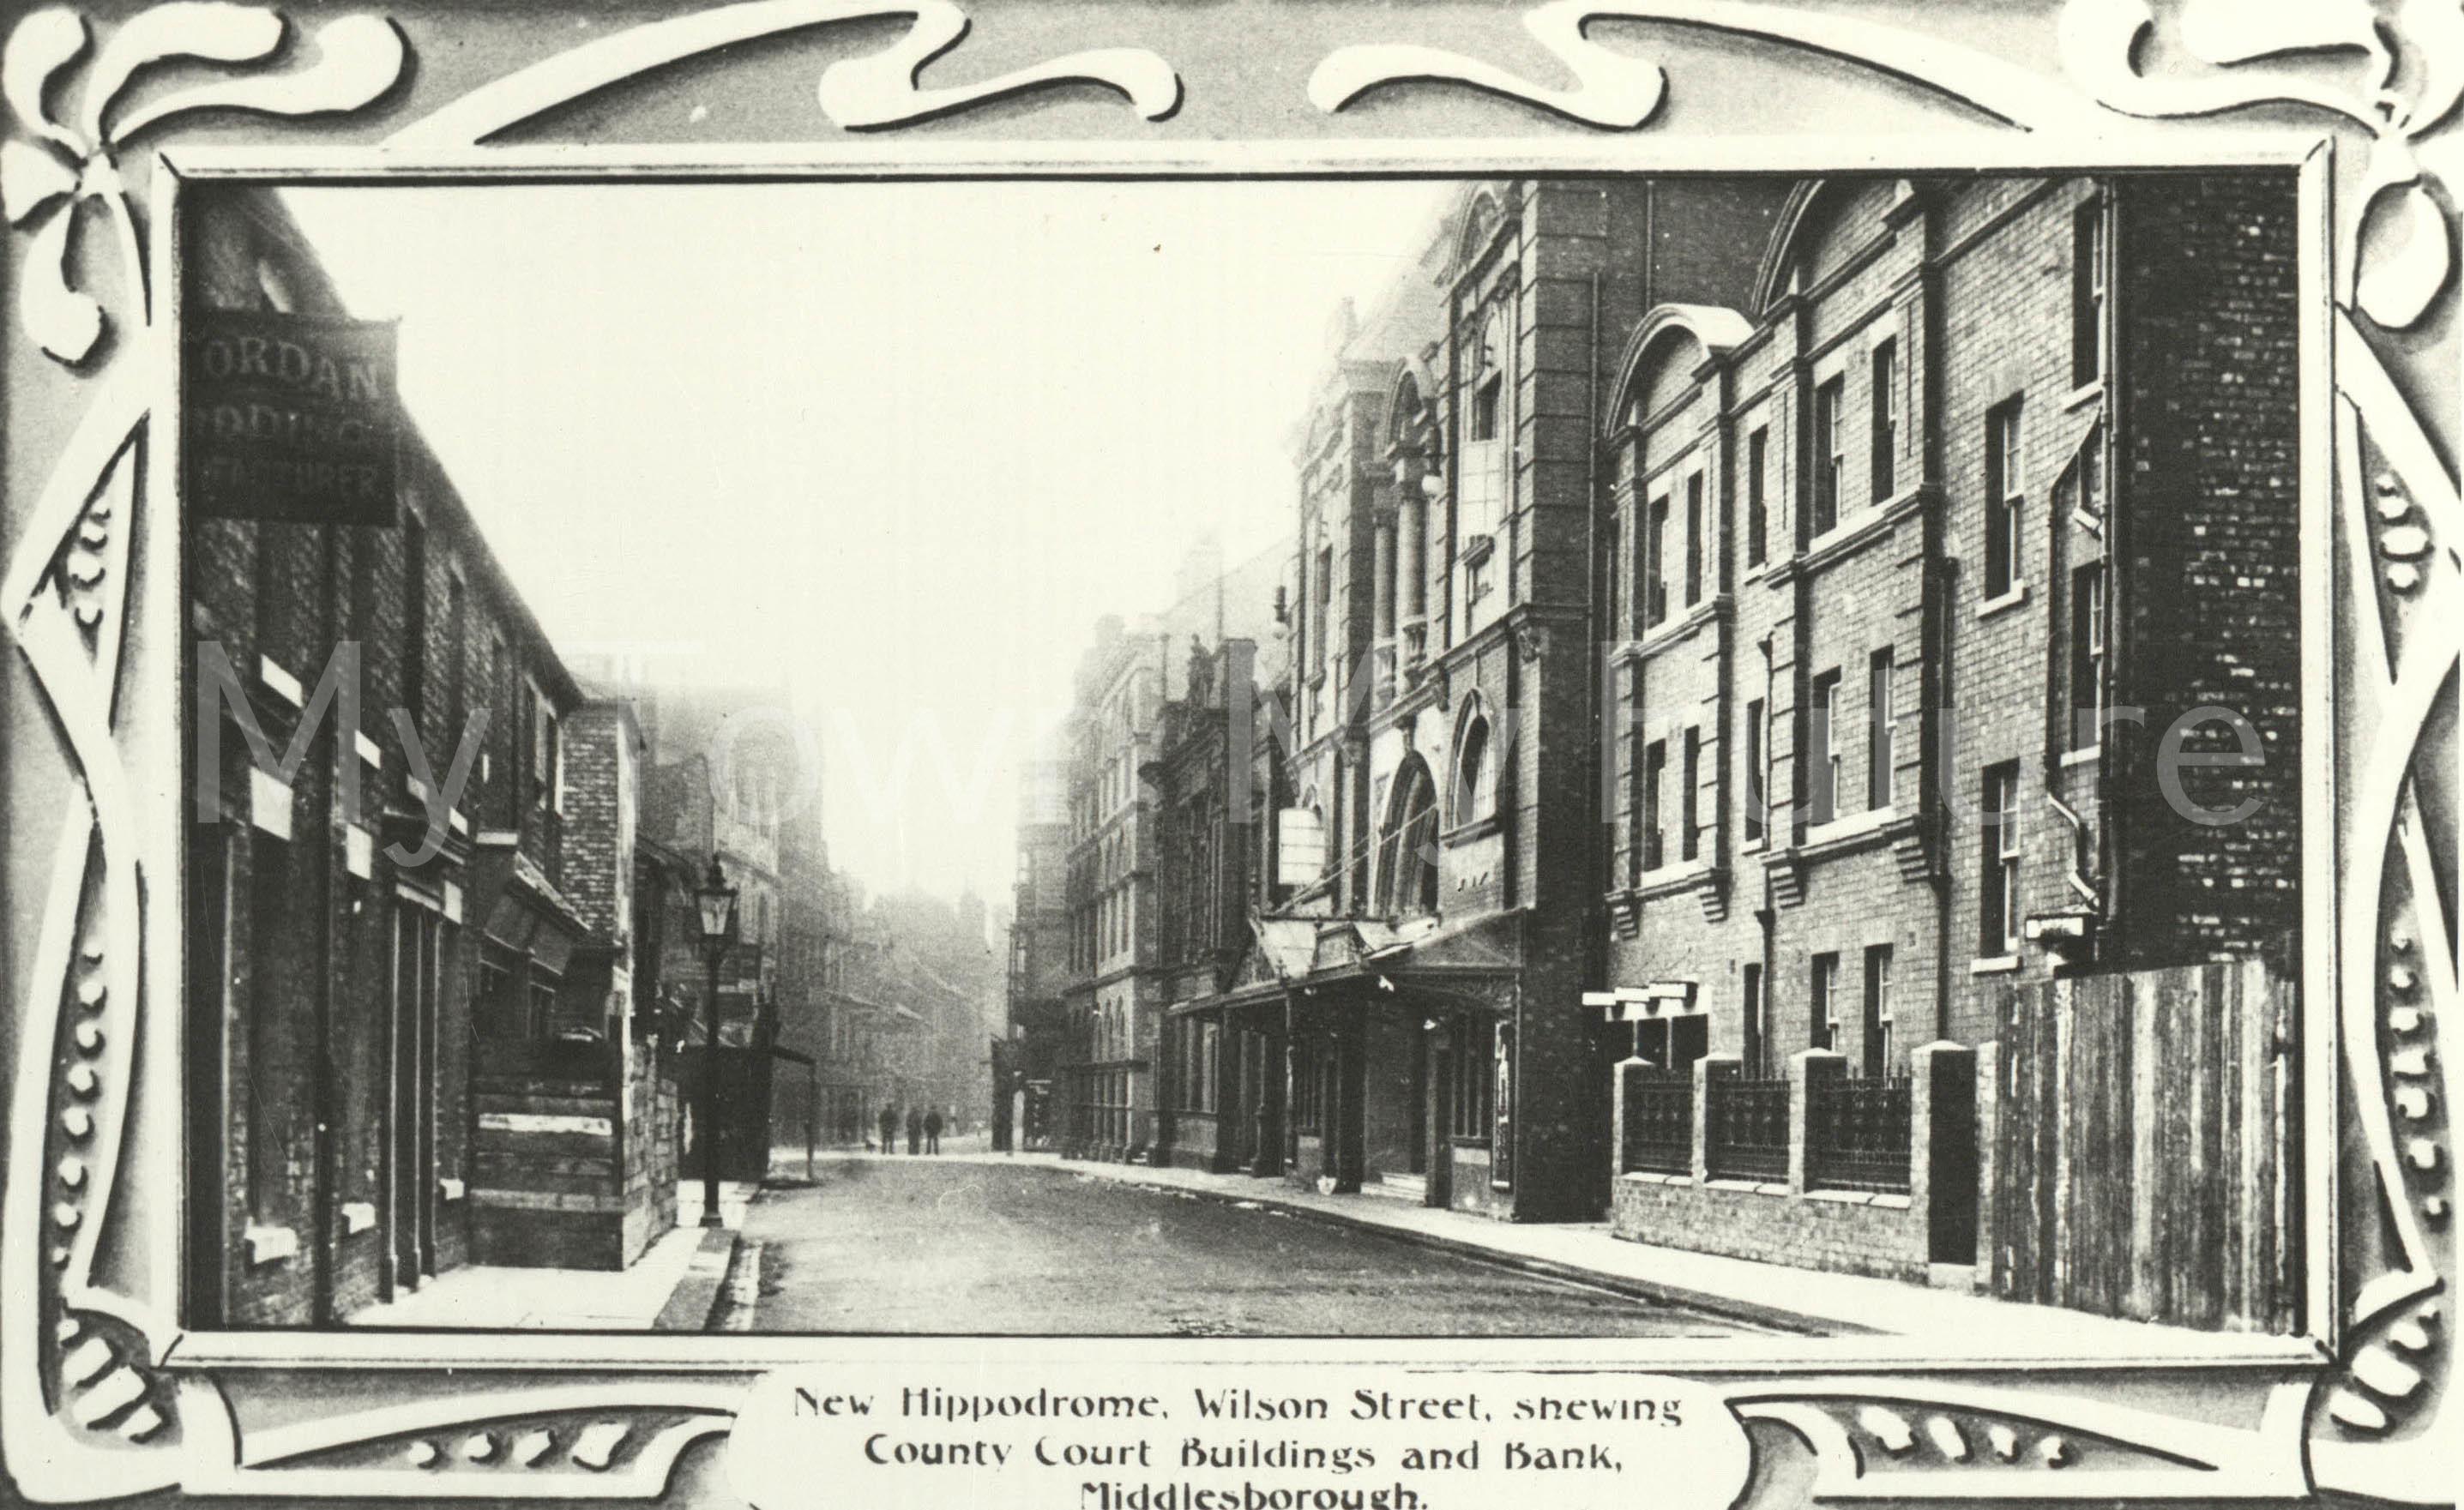 Wilson Street